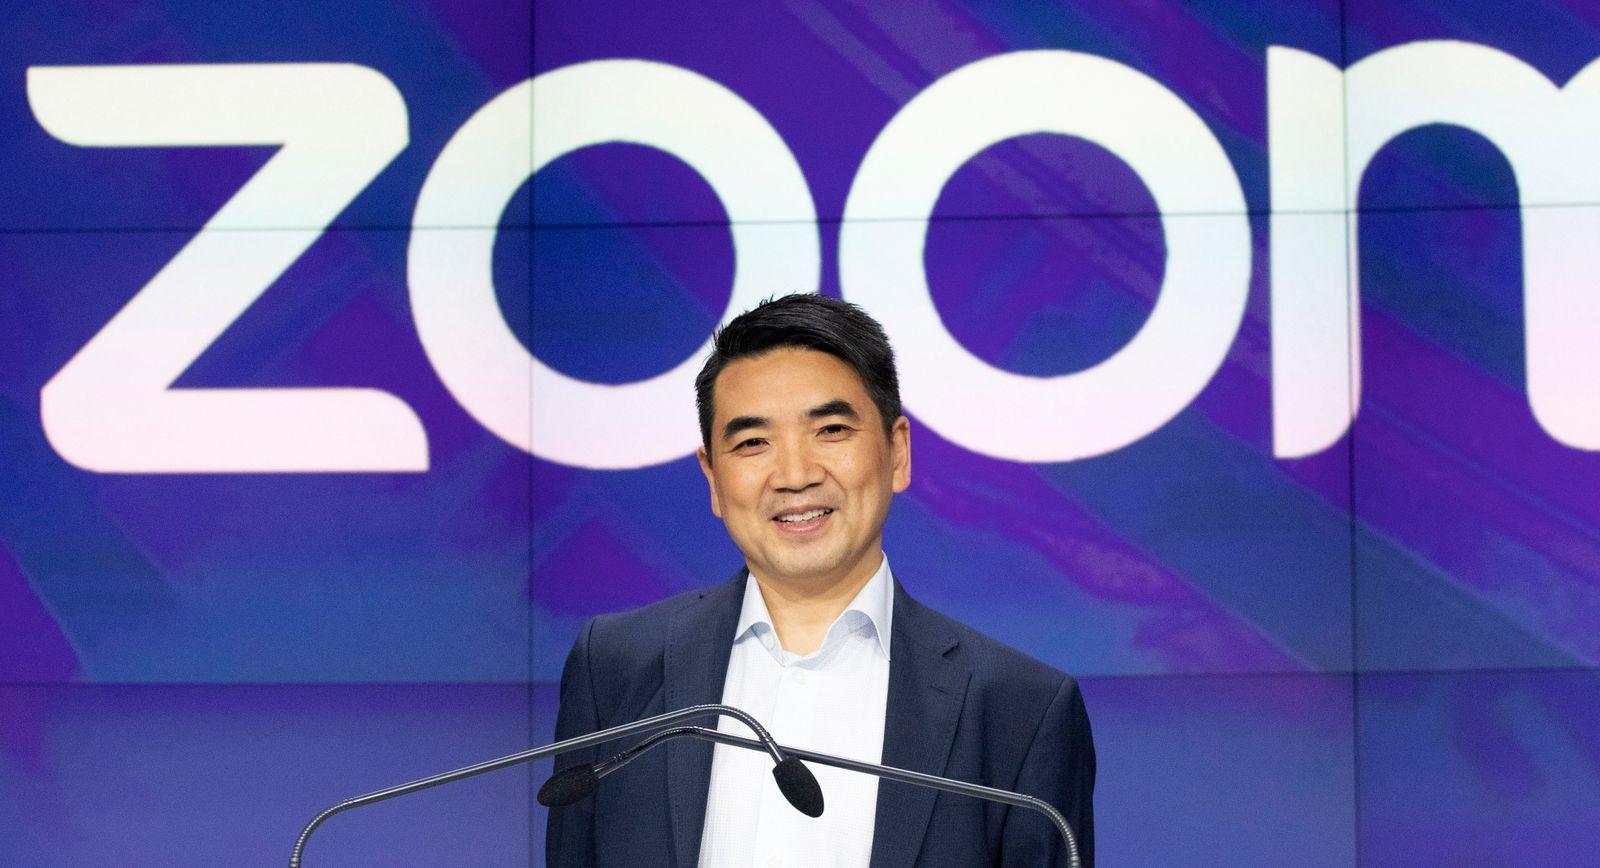 Financial Markets Zoom IPO